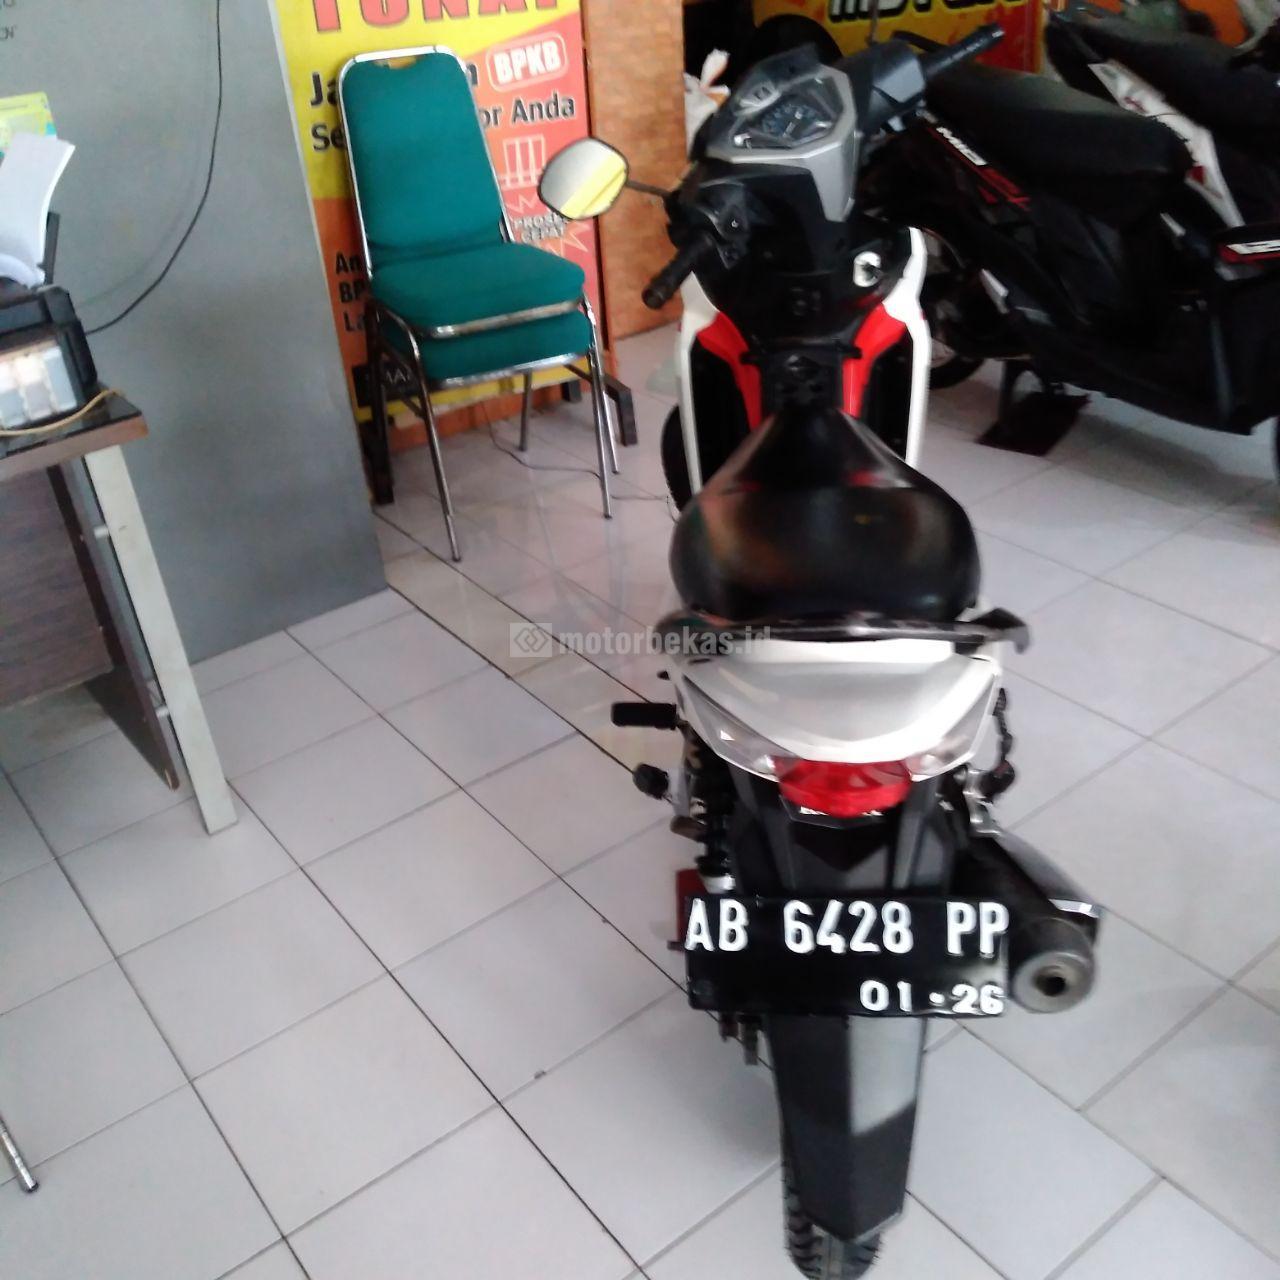 HONDA SUPRA 125  2540 motorbekas.id